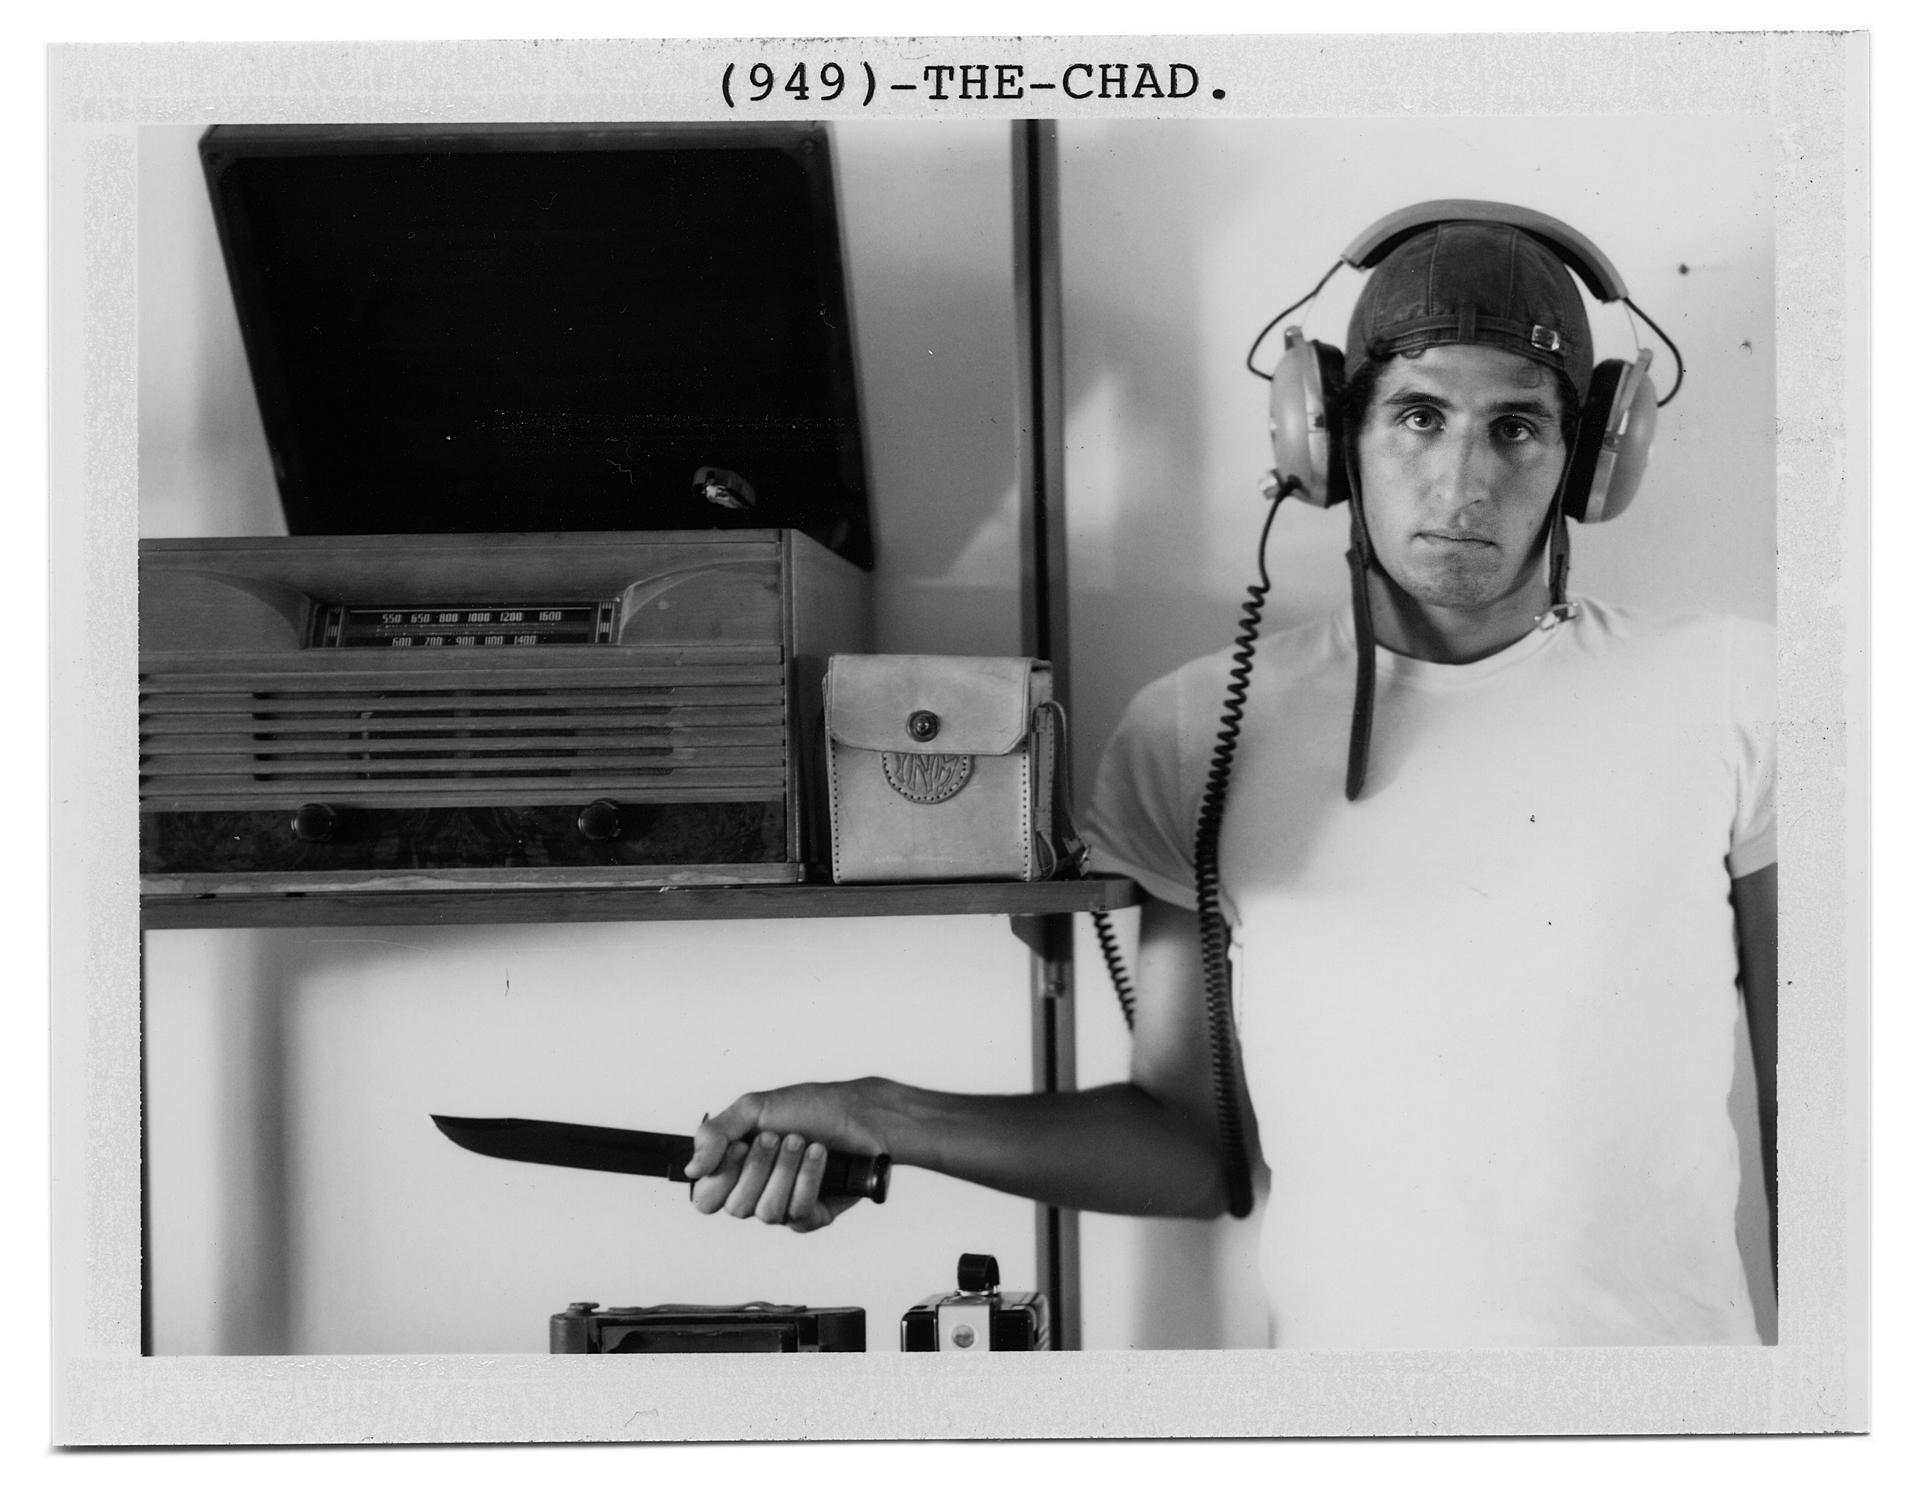 Chad Cheverier